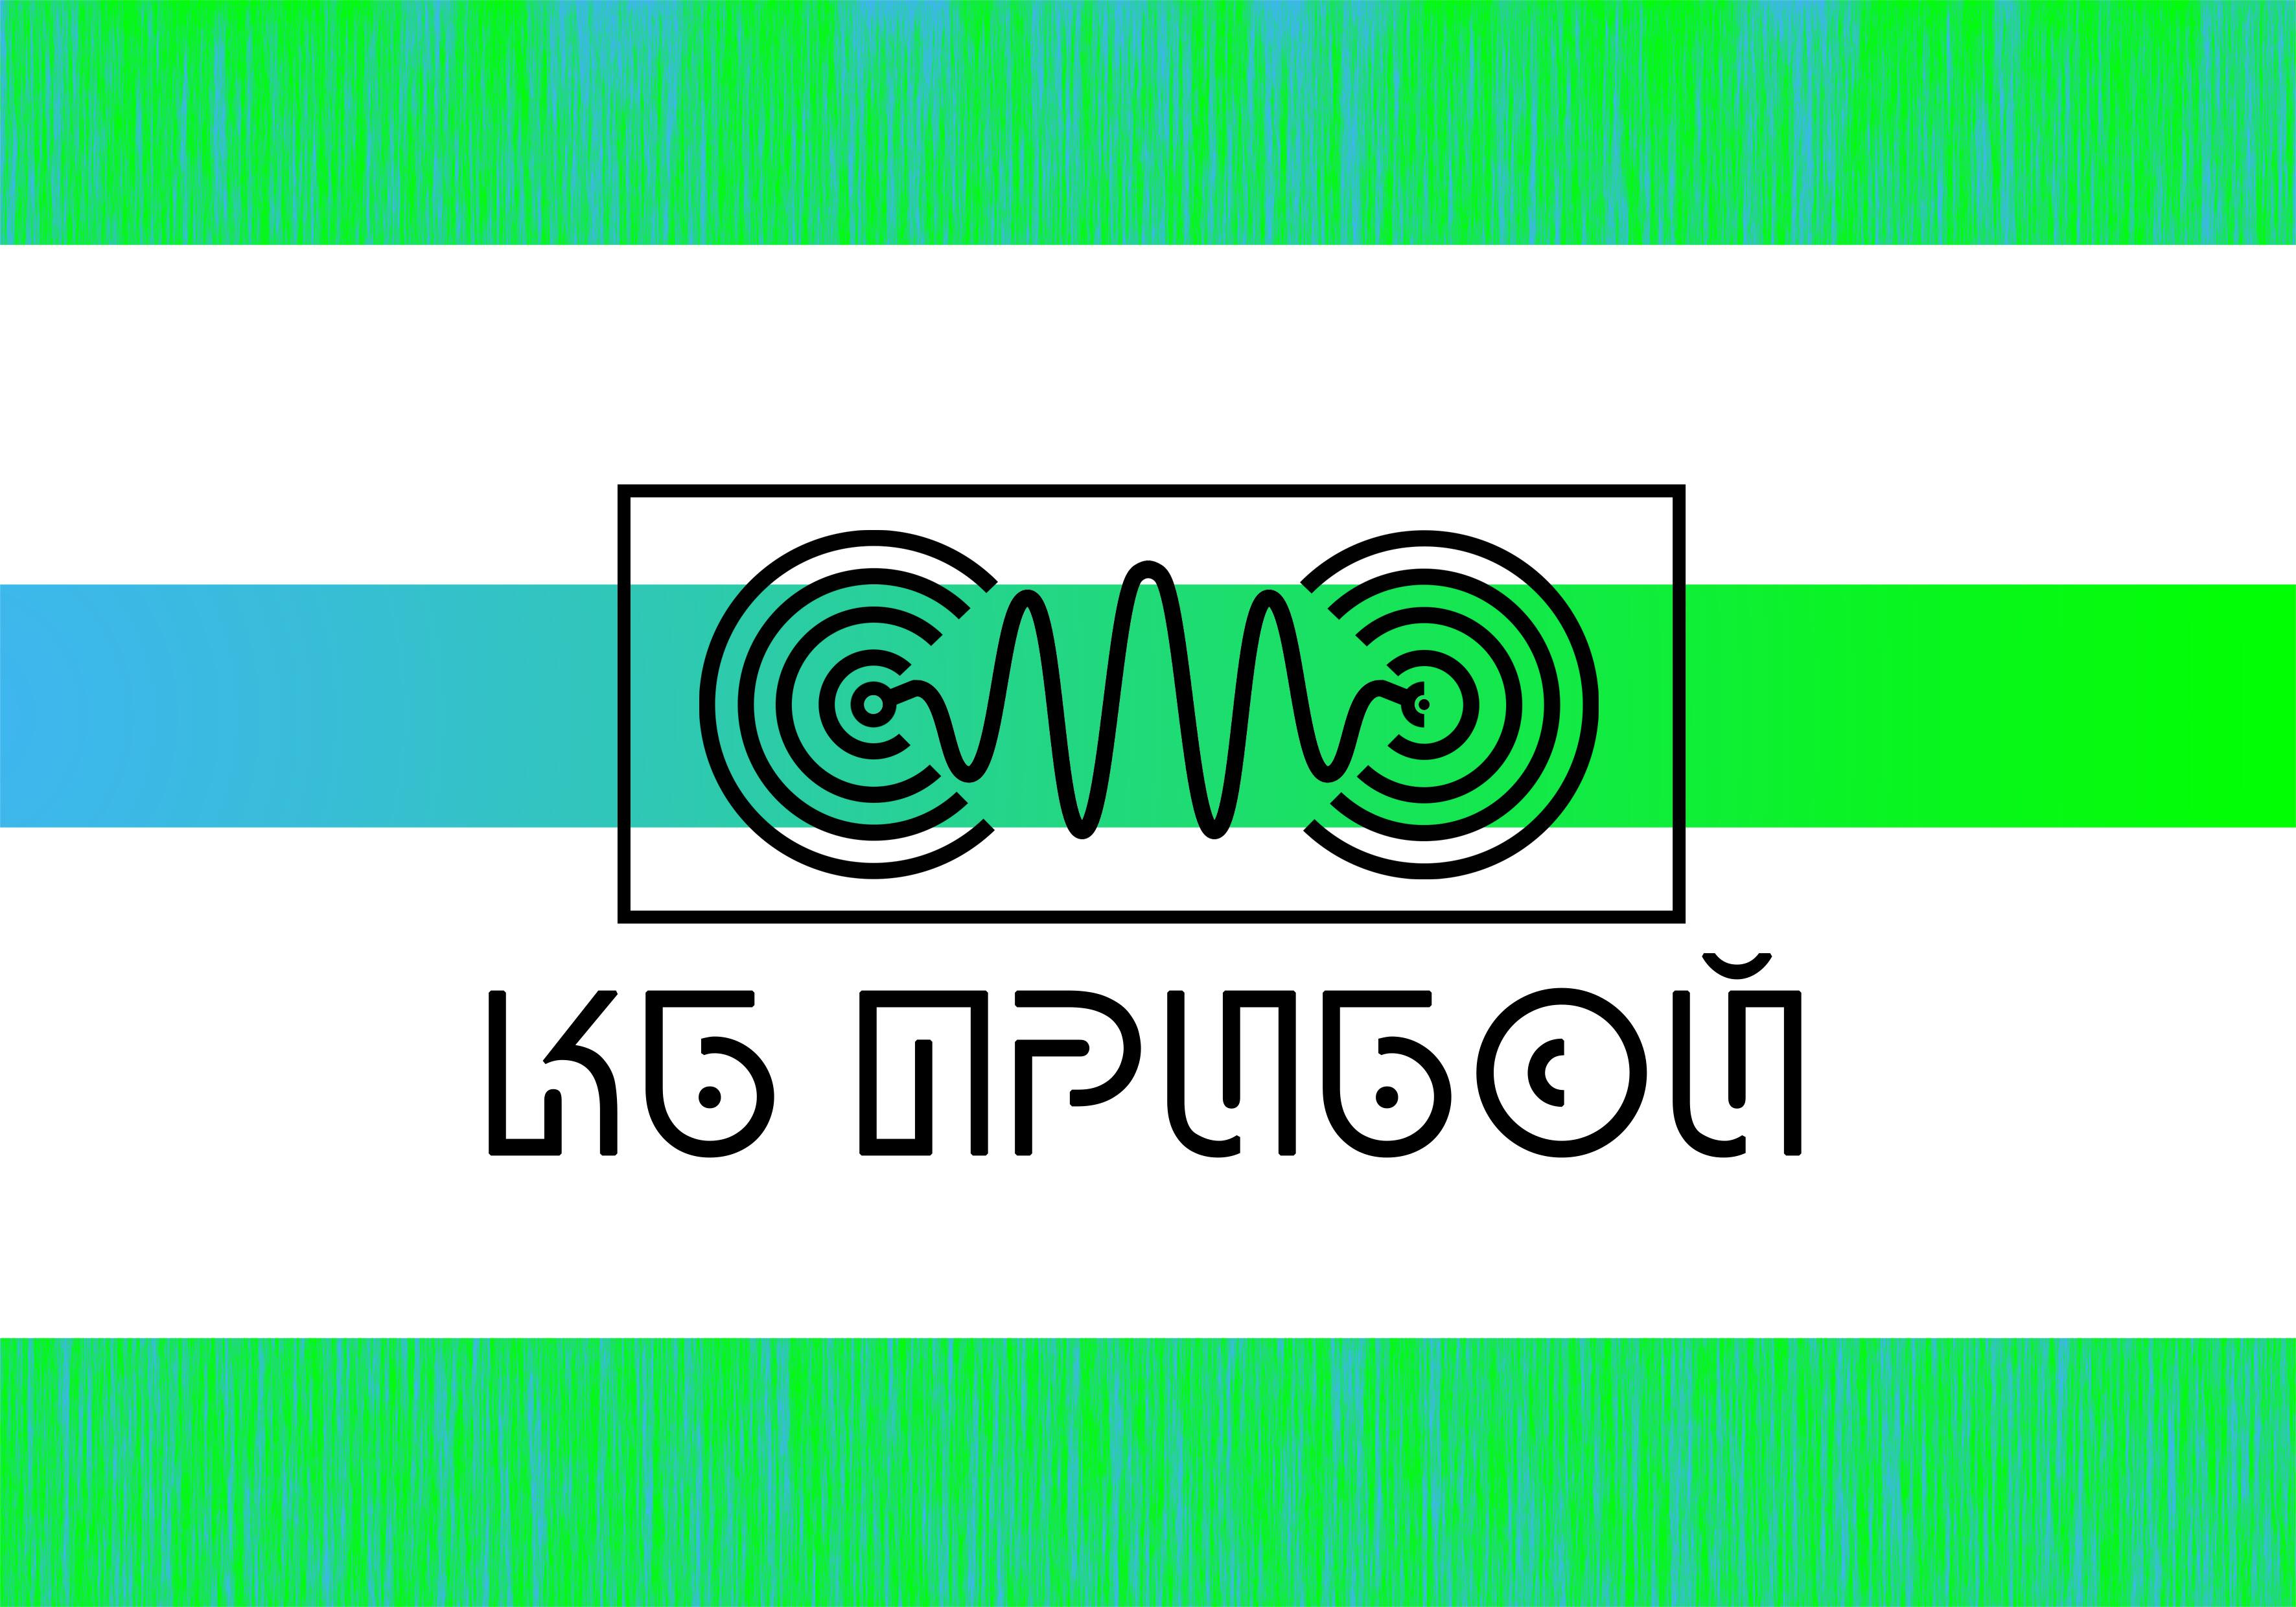 Разработка логотипа и фирменного стиля для КБ Прибой фото f_6785b296af111f5b.jpg